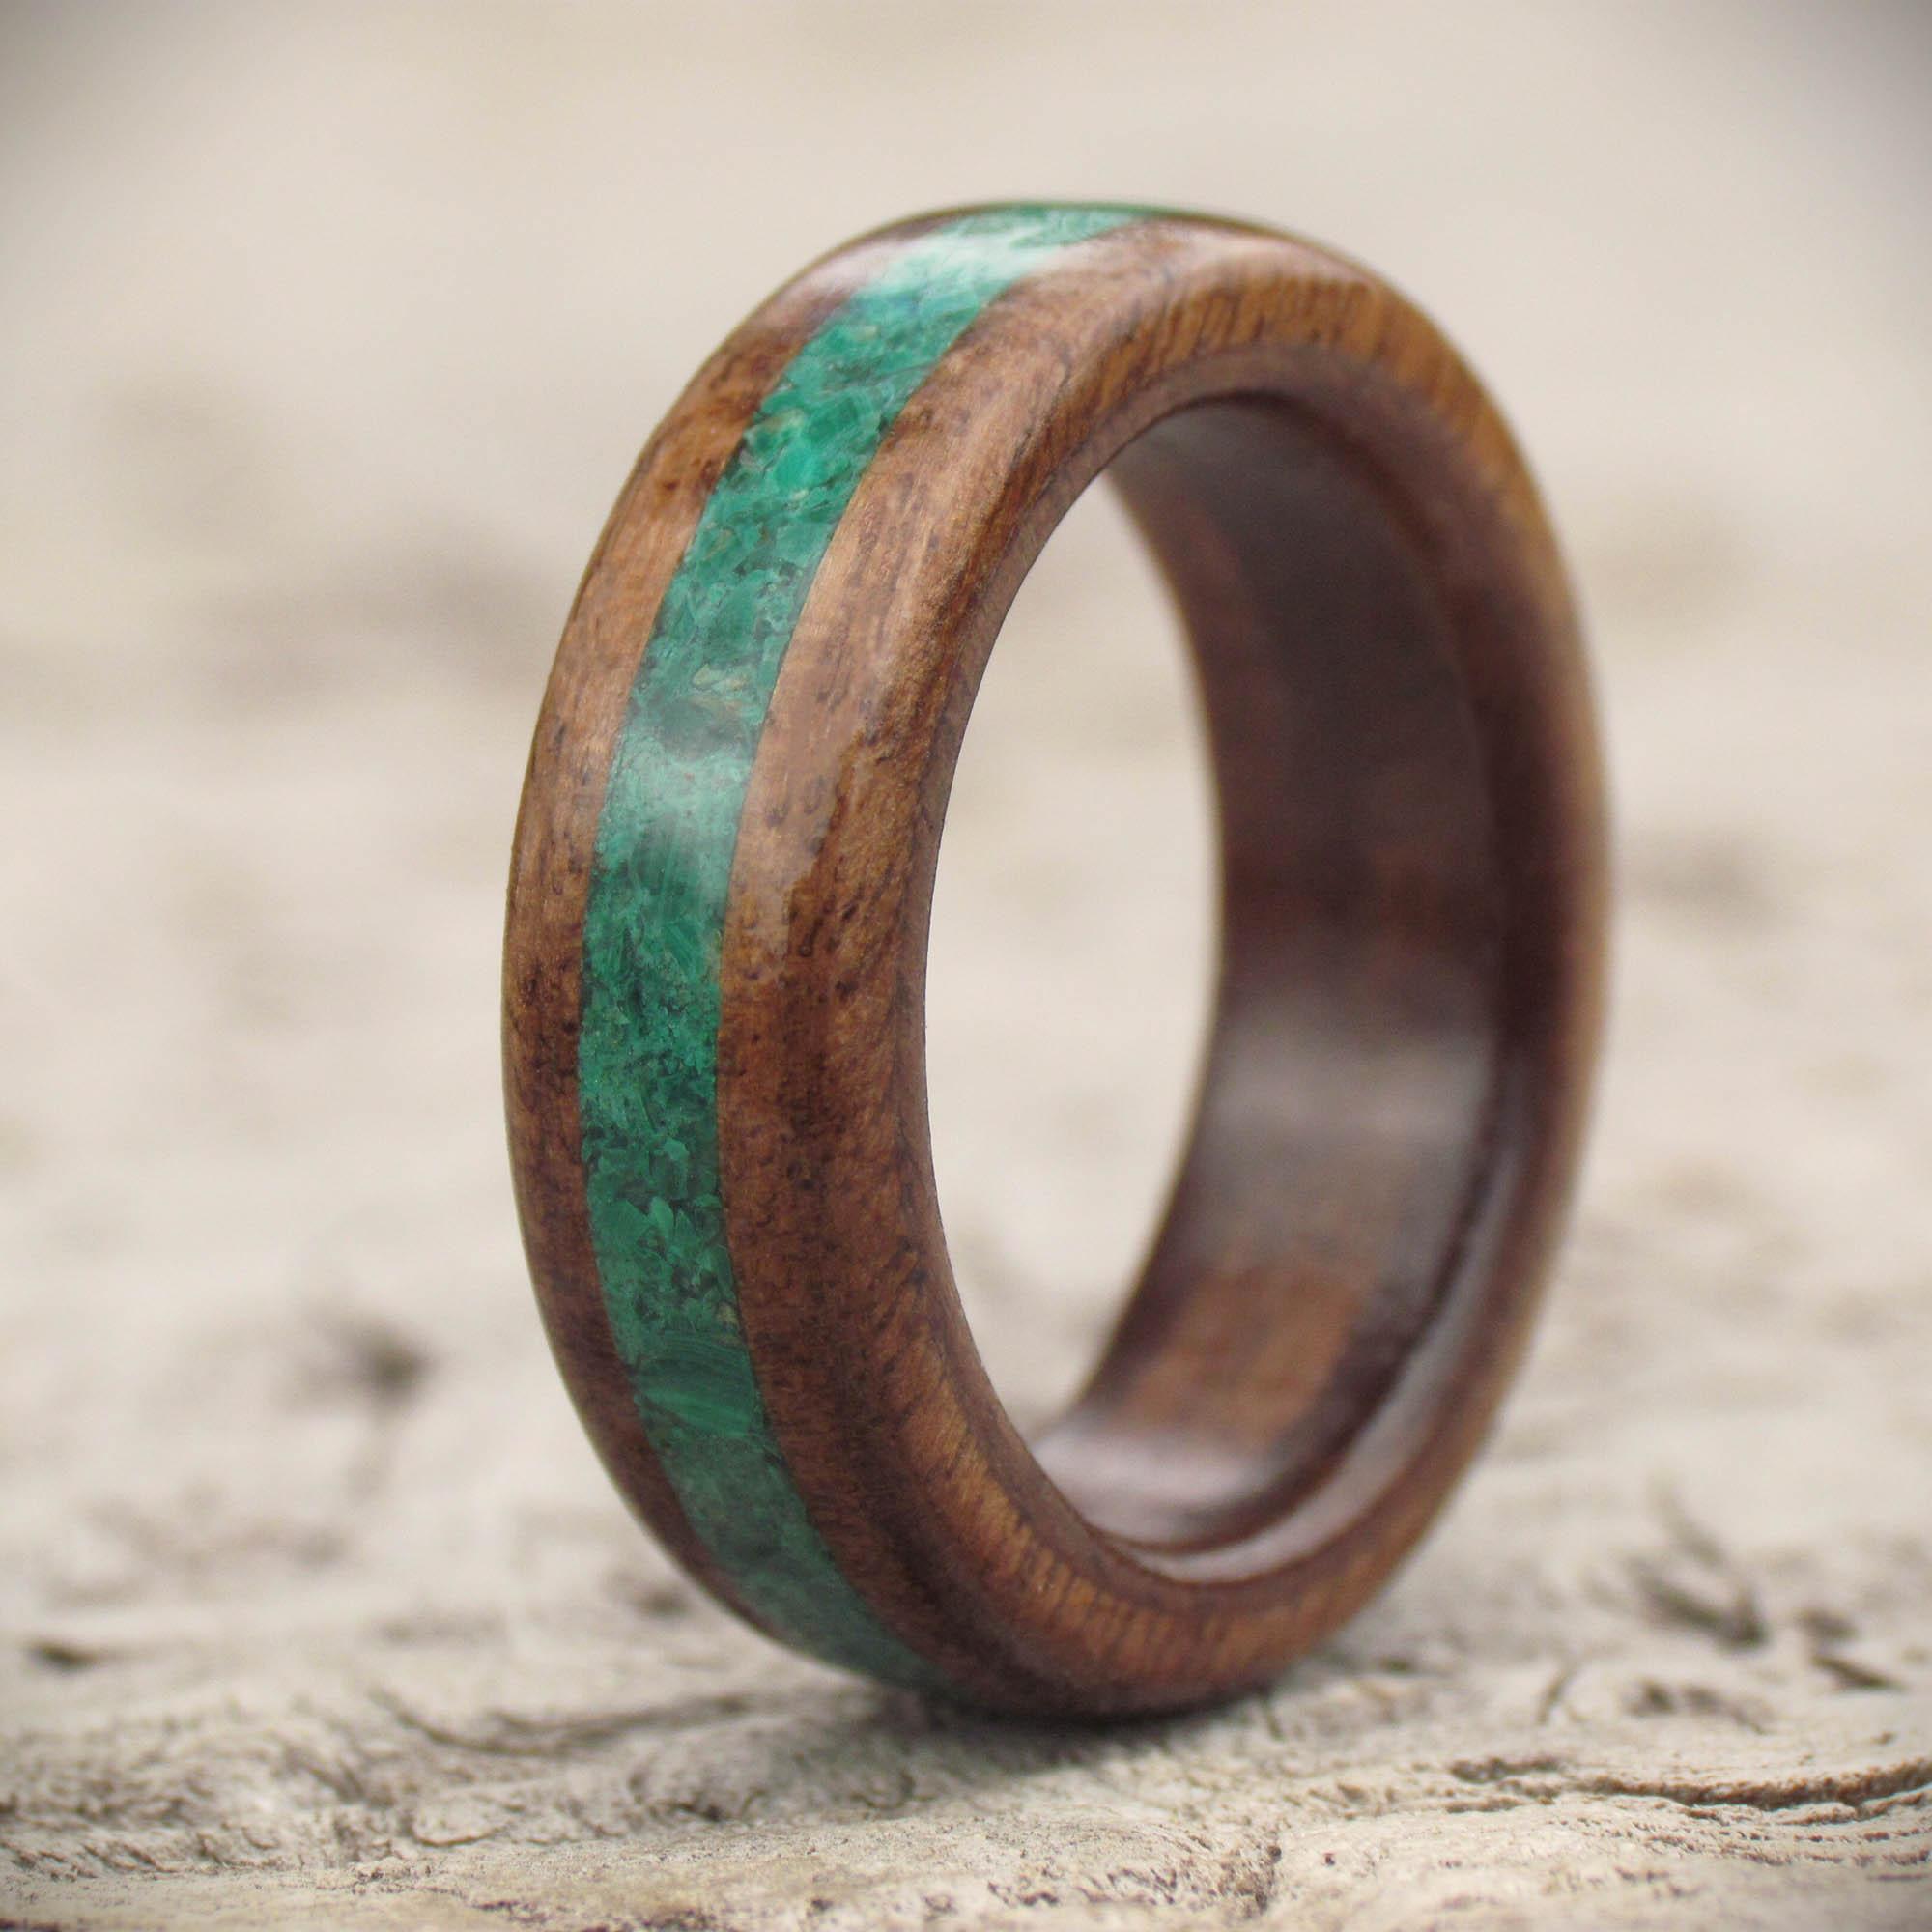 Walnut and gemstone wooden ring